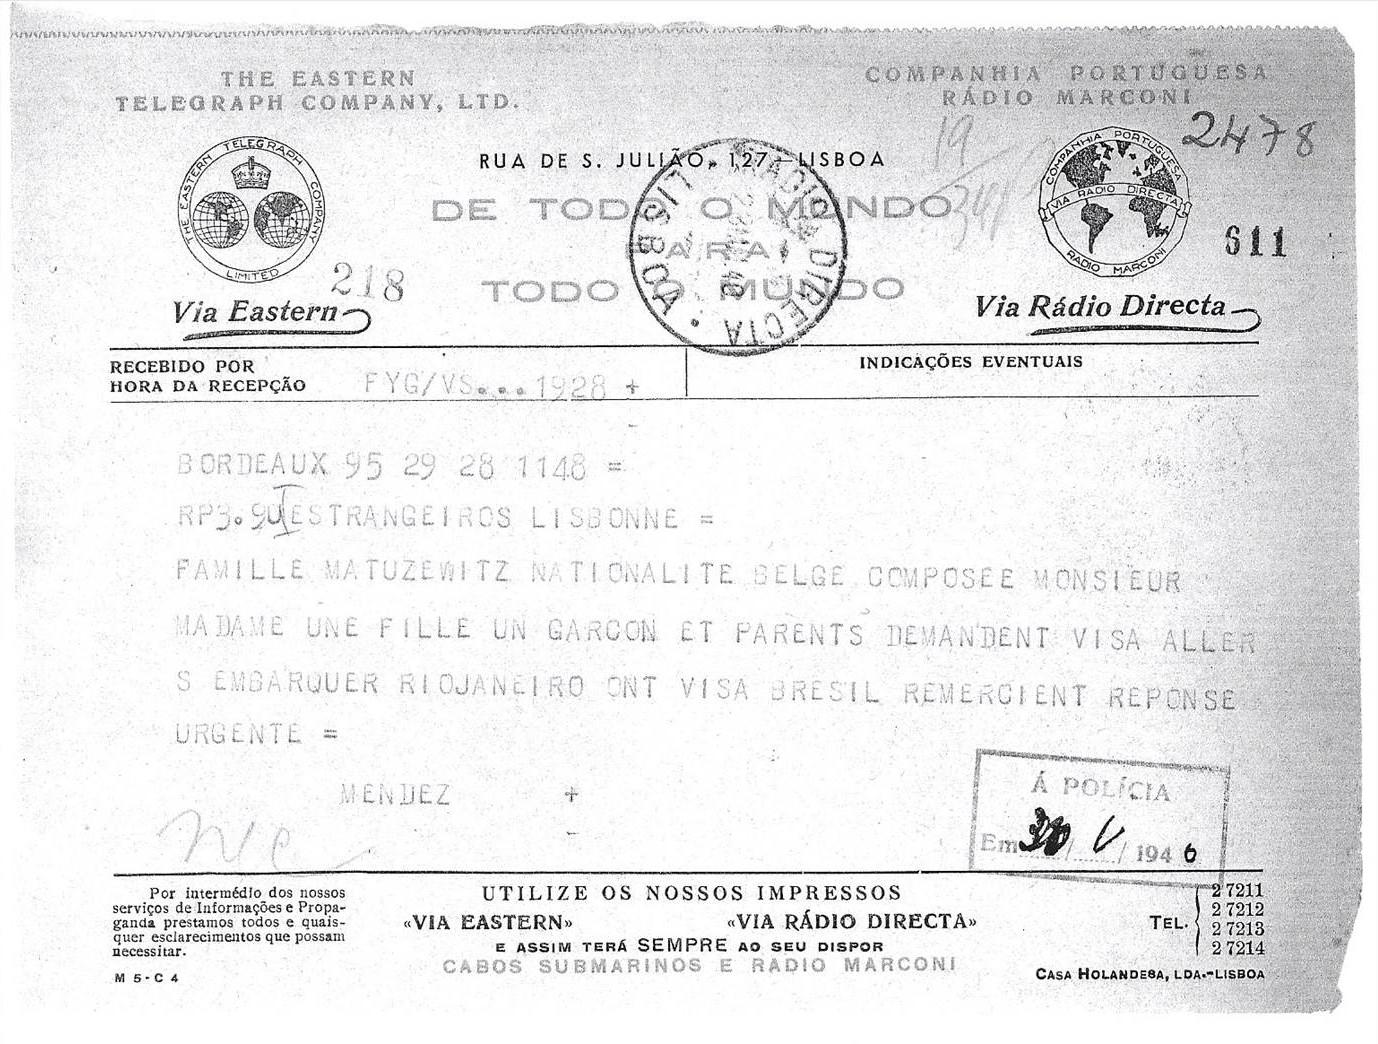 Visa request MATUZEWITZ